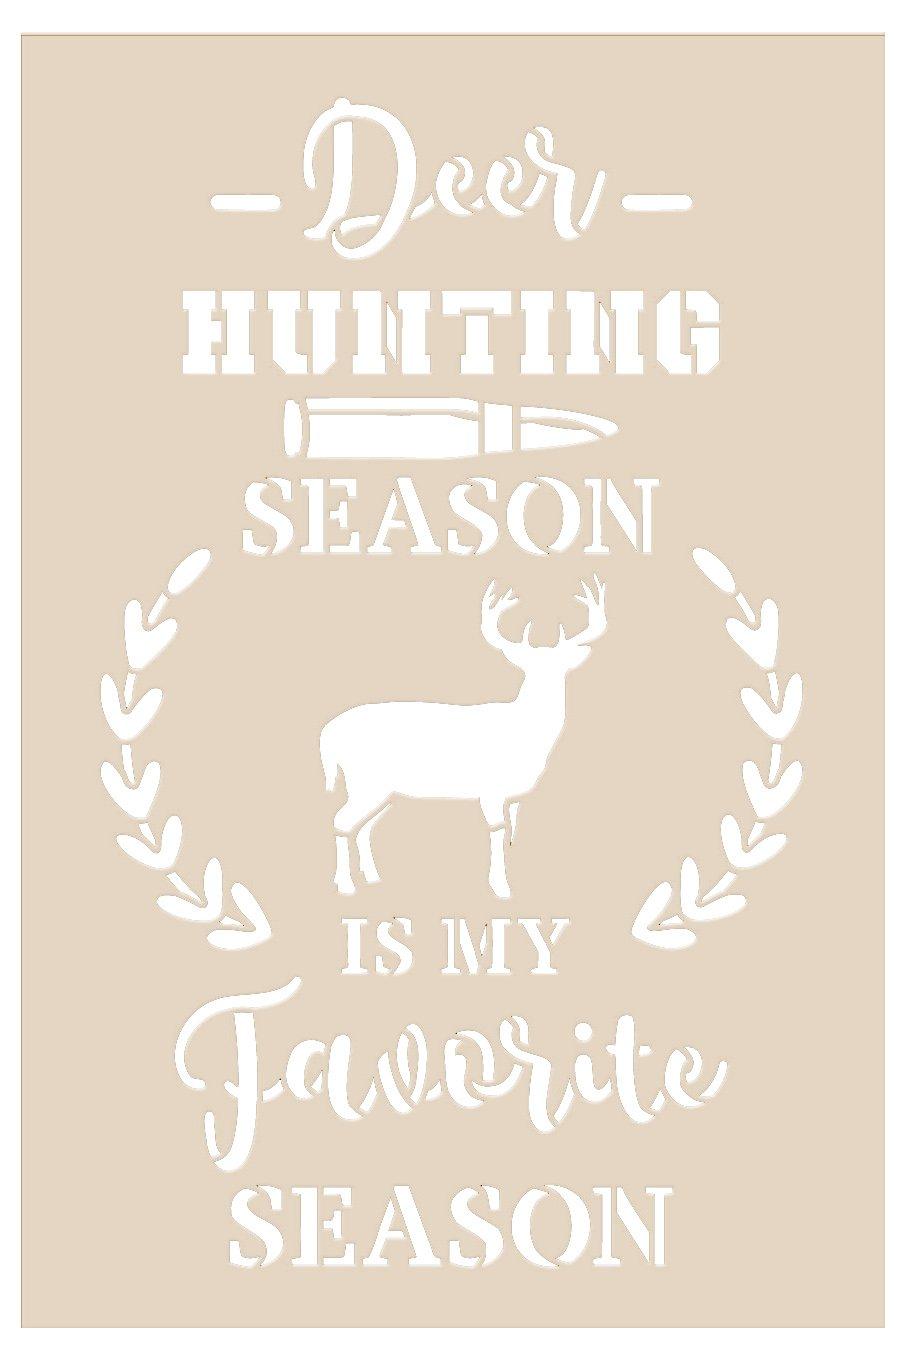 Deer Hunting Favorite Season Stencil by StudioR12 | DIY Nature Laurel Home Decor Gift | Craft & Paint Wood Sign | Reusable Mylar Template Select Size